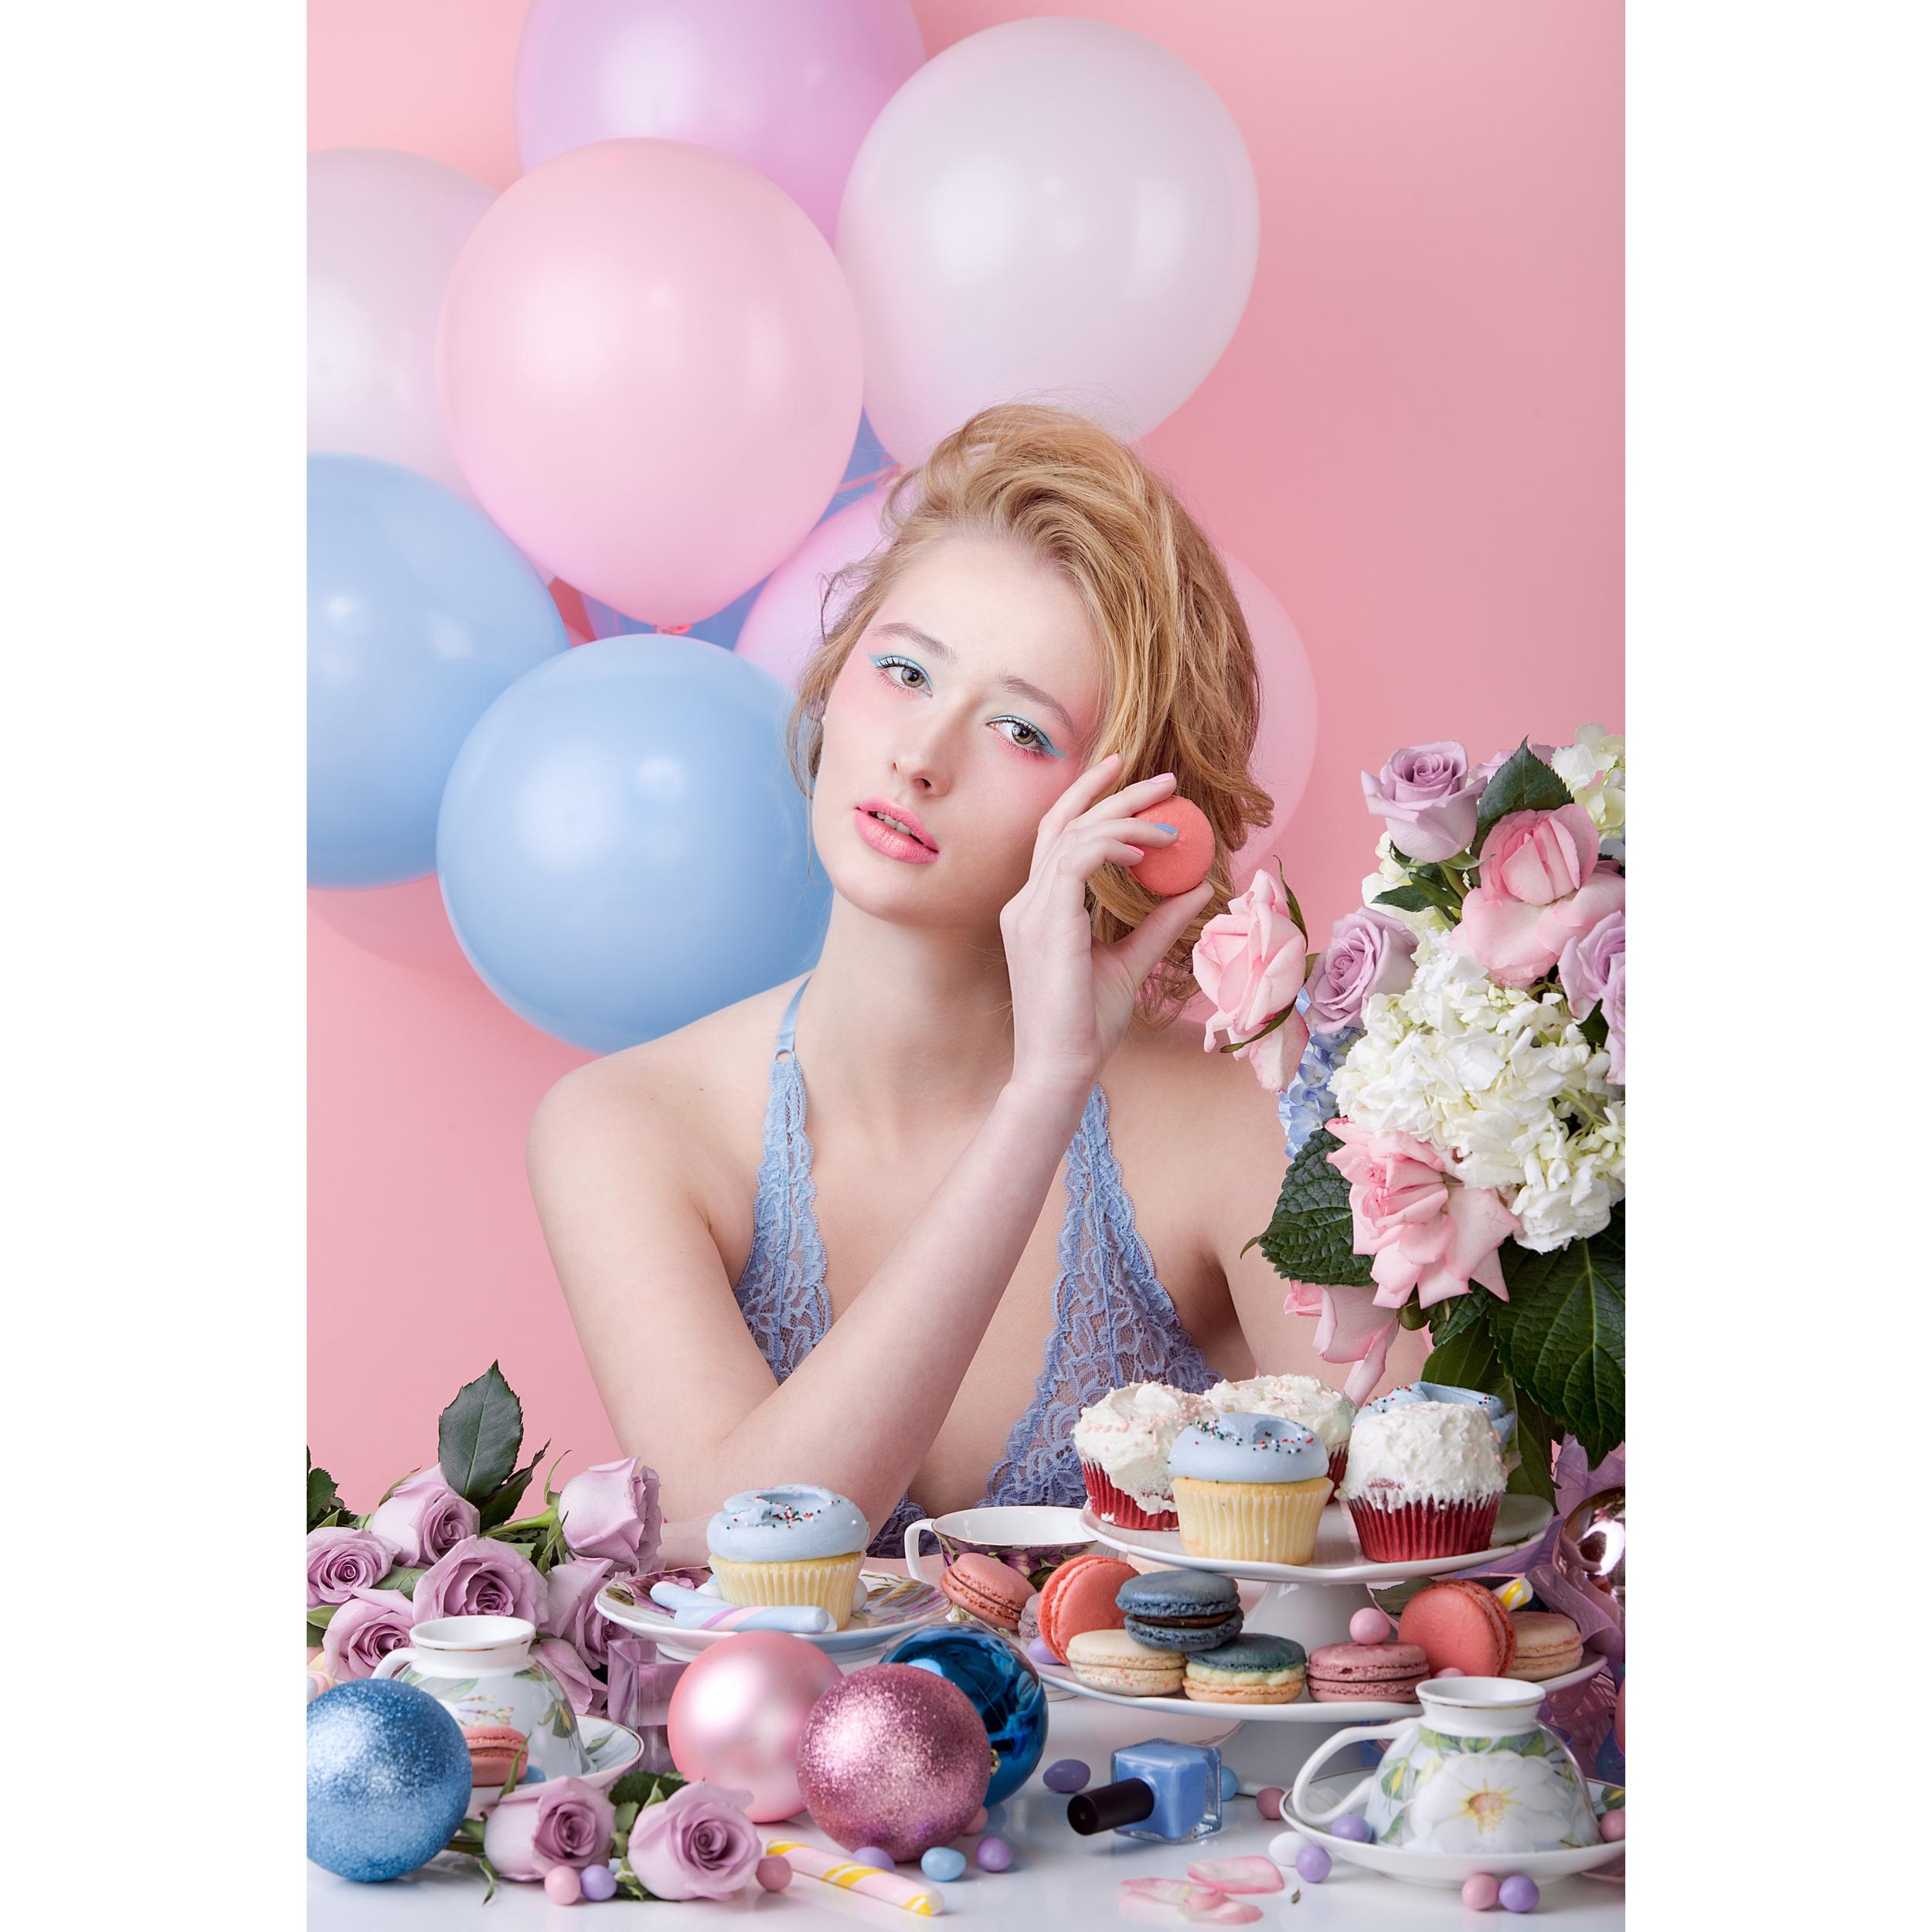 Candy Dream-C151220 Maria-2756-Edit copy.jpg